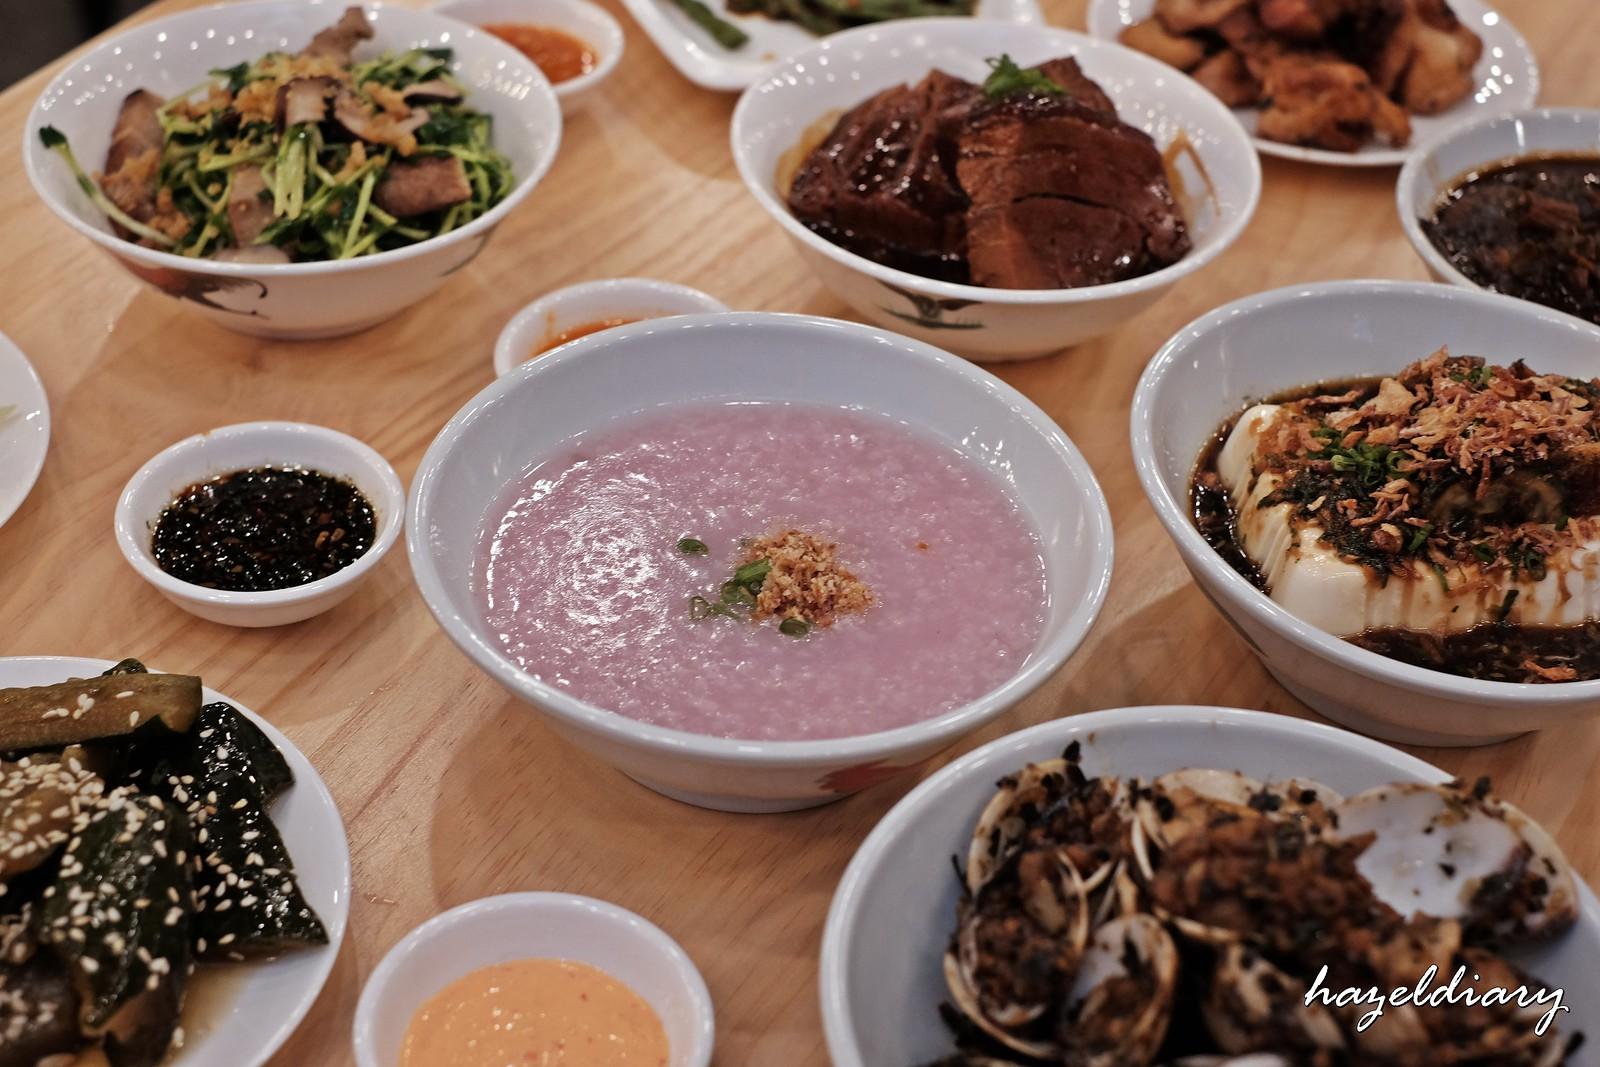 The Salted Plum-Sweet Potato Porridge